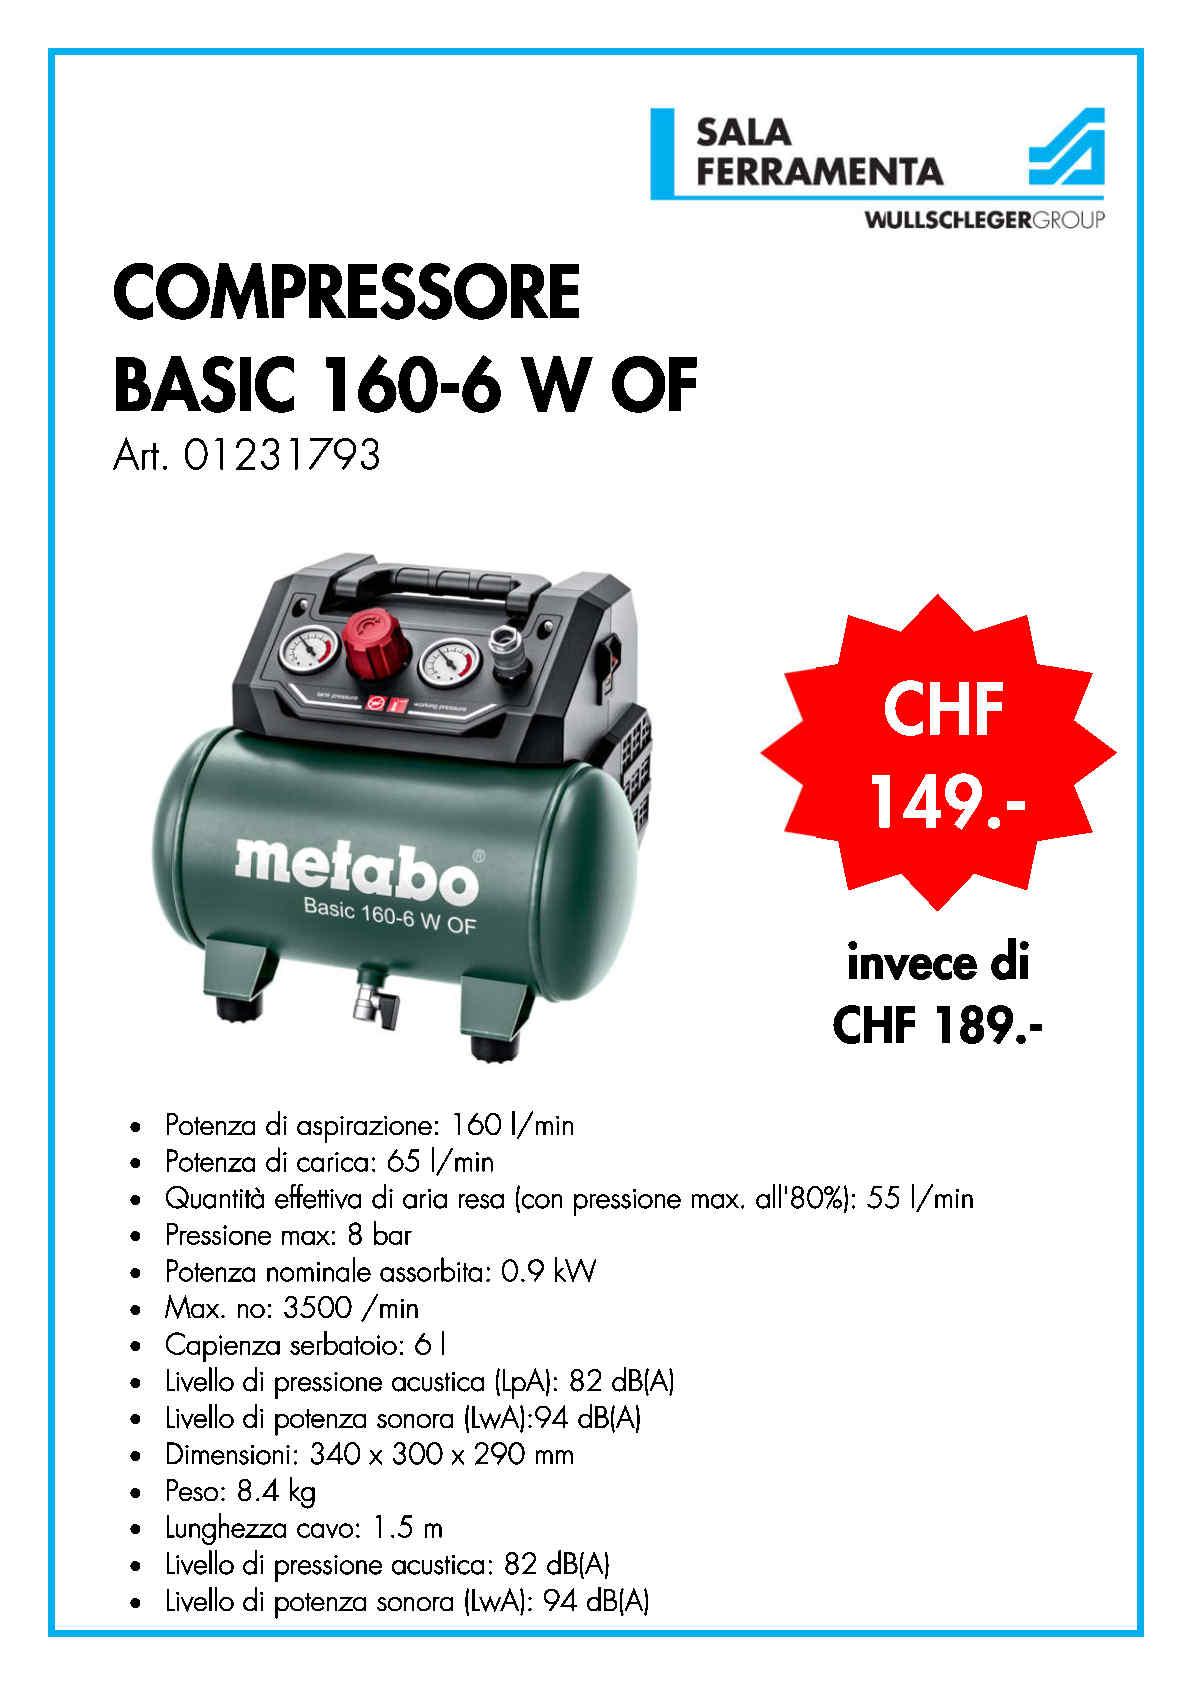 COMPRESSORE BASIC 160-6 W OF